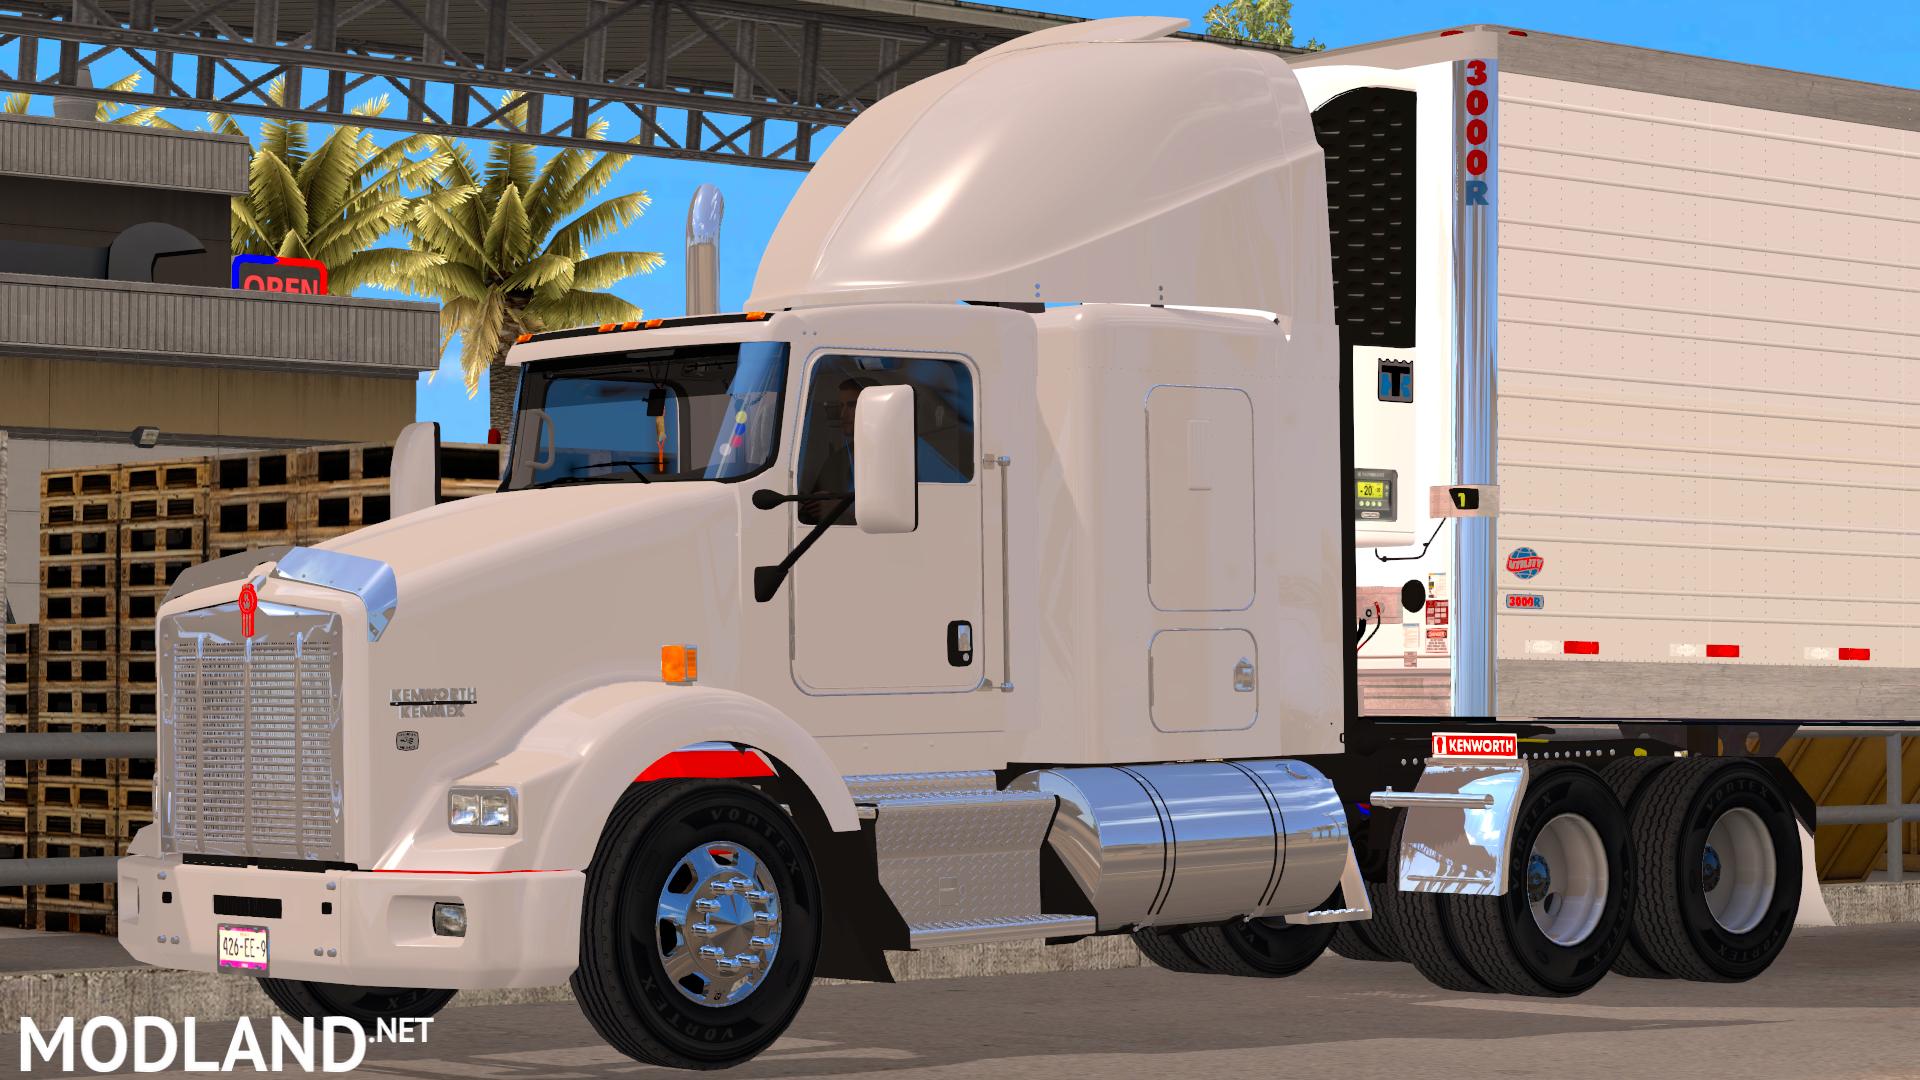 Kenworth t800 mod for American Truck Simulator, ATS